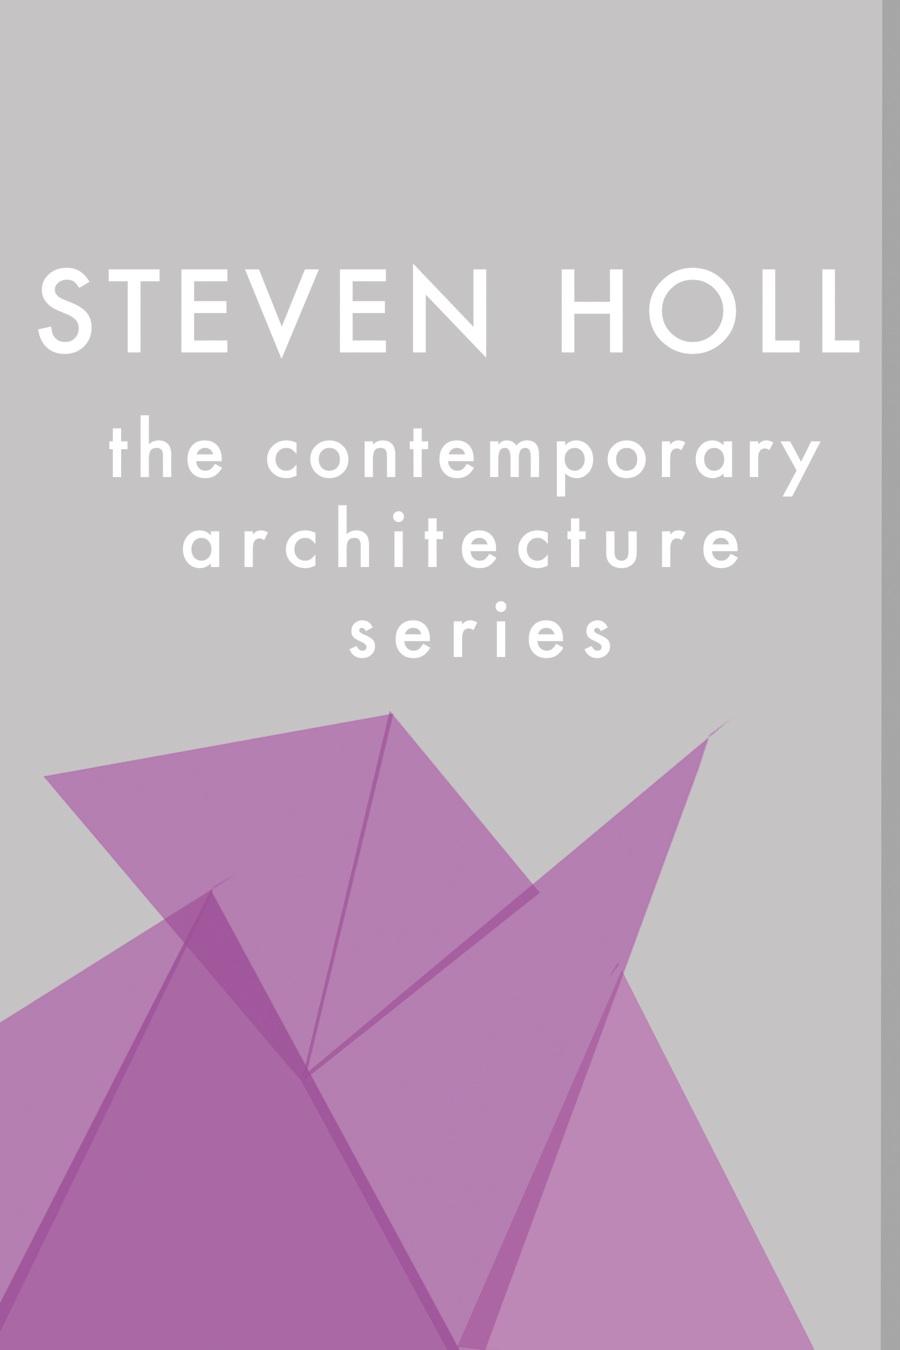 Steven Holl Project ( 1800x 2700 pxl) Graphic design.jpg